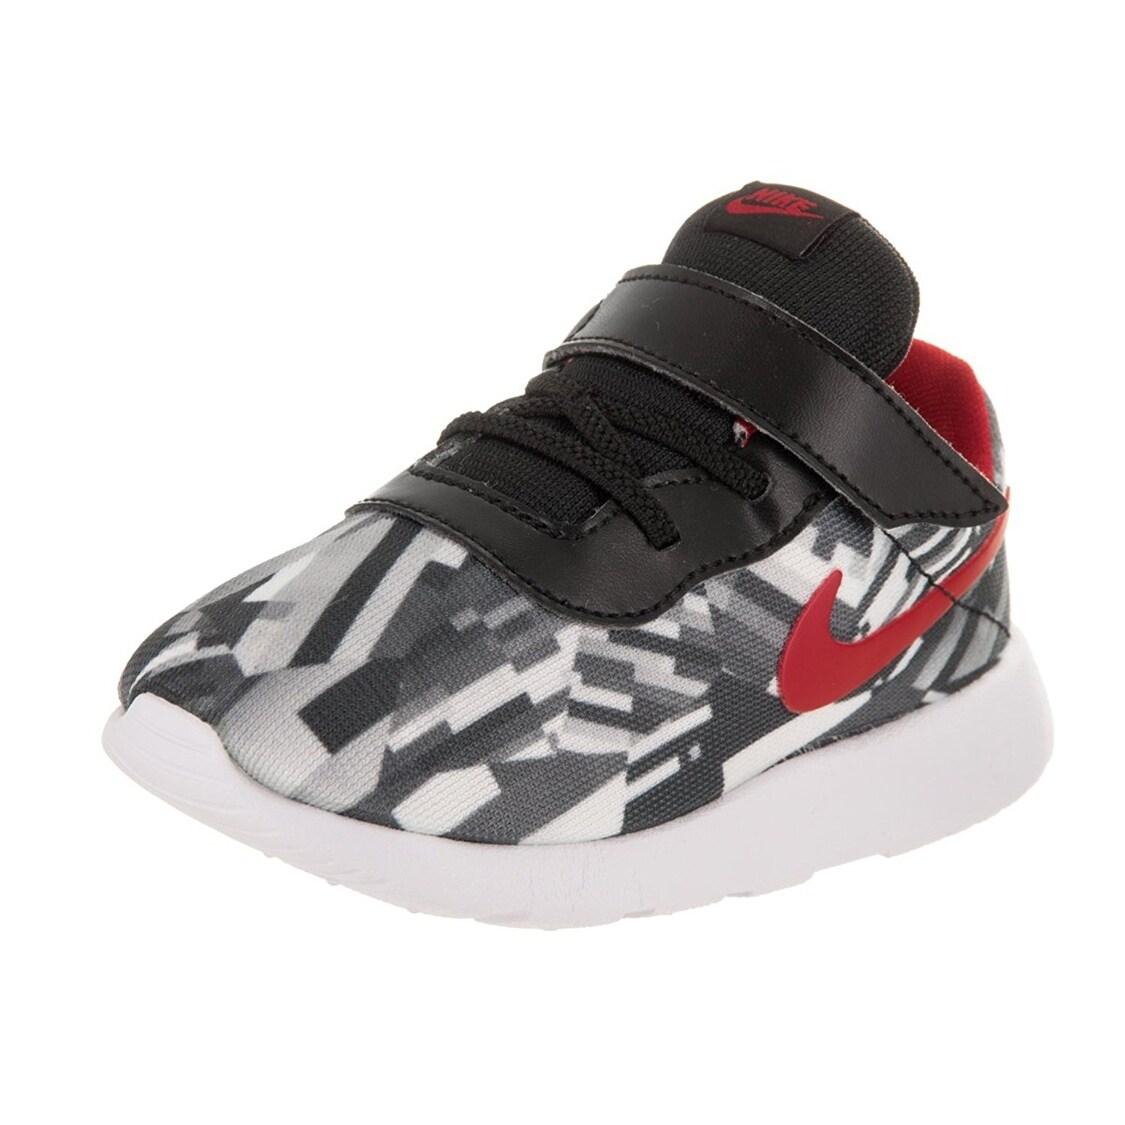 designer fashion 72221 2e129 Shop Nike Toddlers Tanjun Print (TDV) Wolf Grey Gym Red Black White Running  Shoe - Free Shipping Today - Overstock.com - 18280163